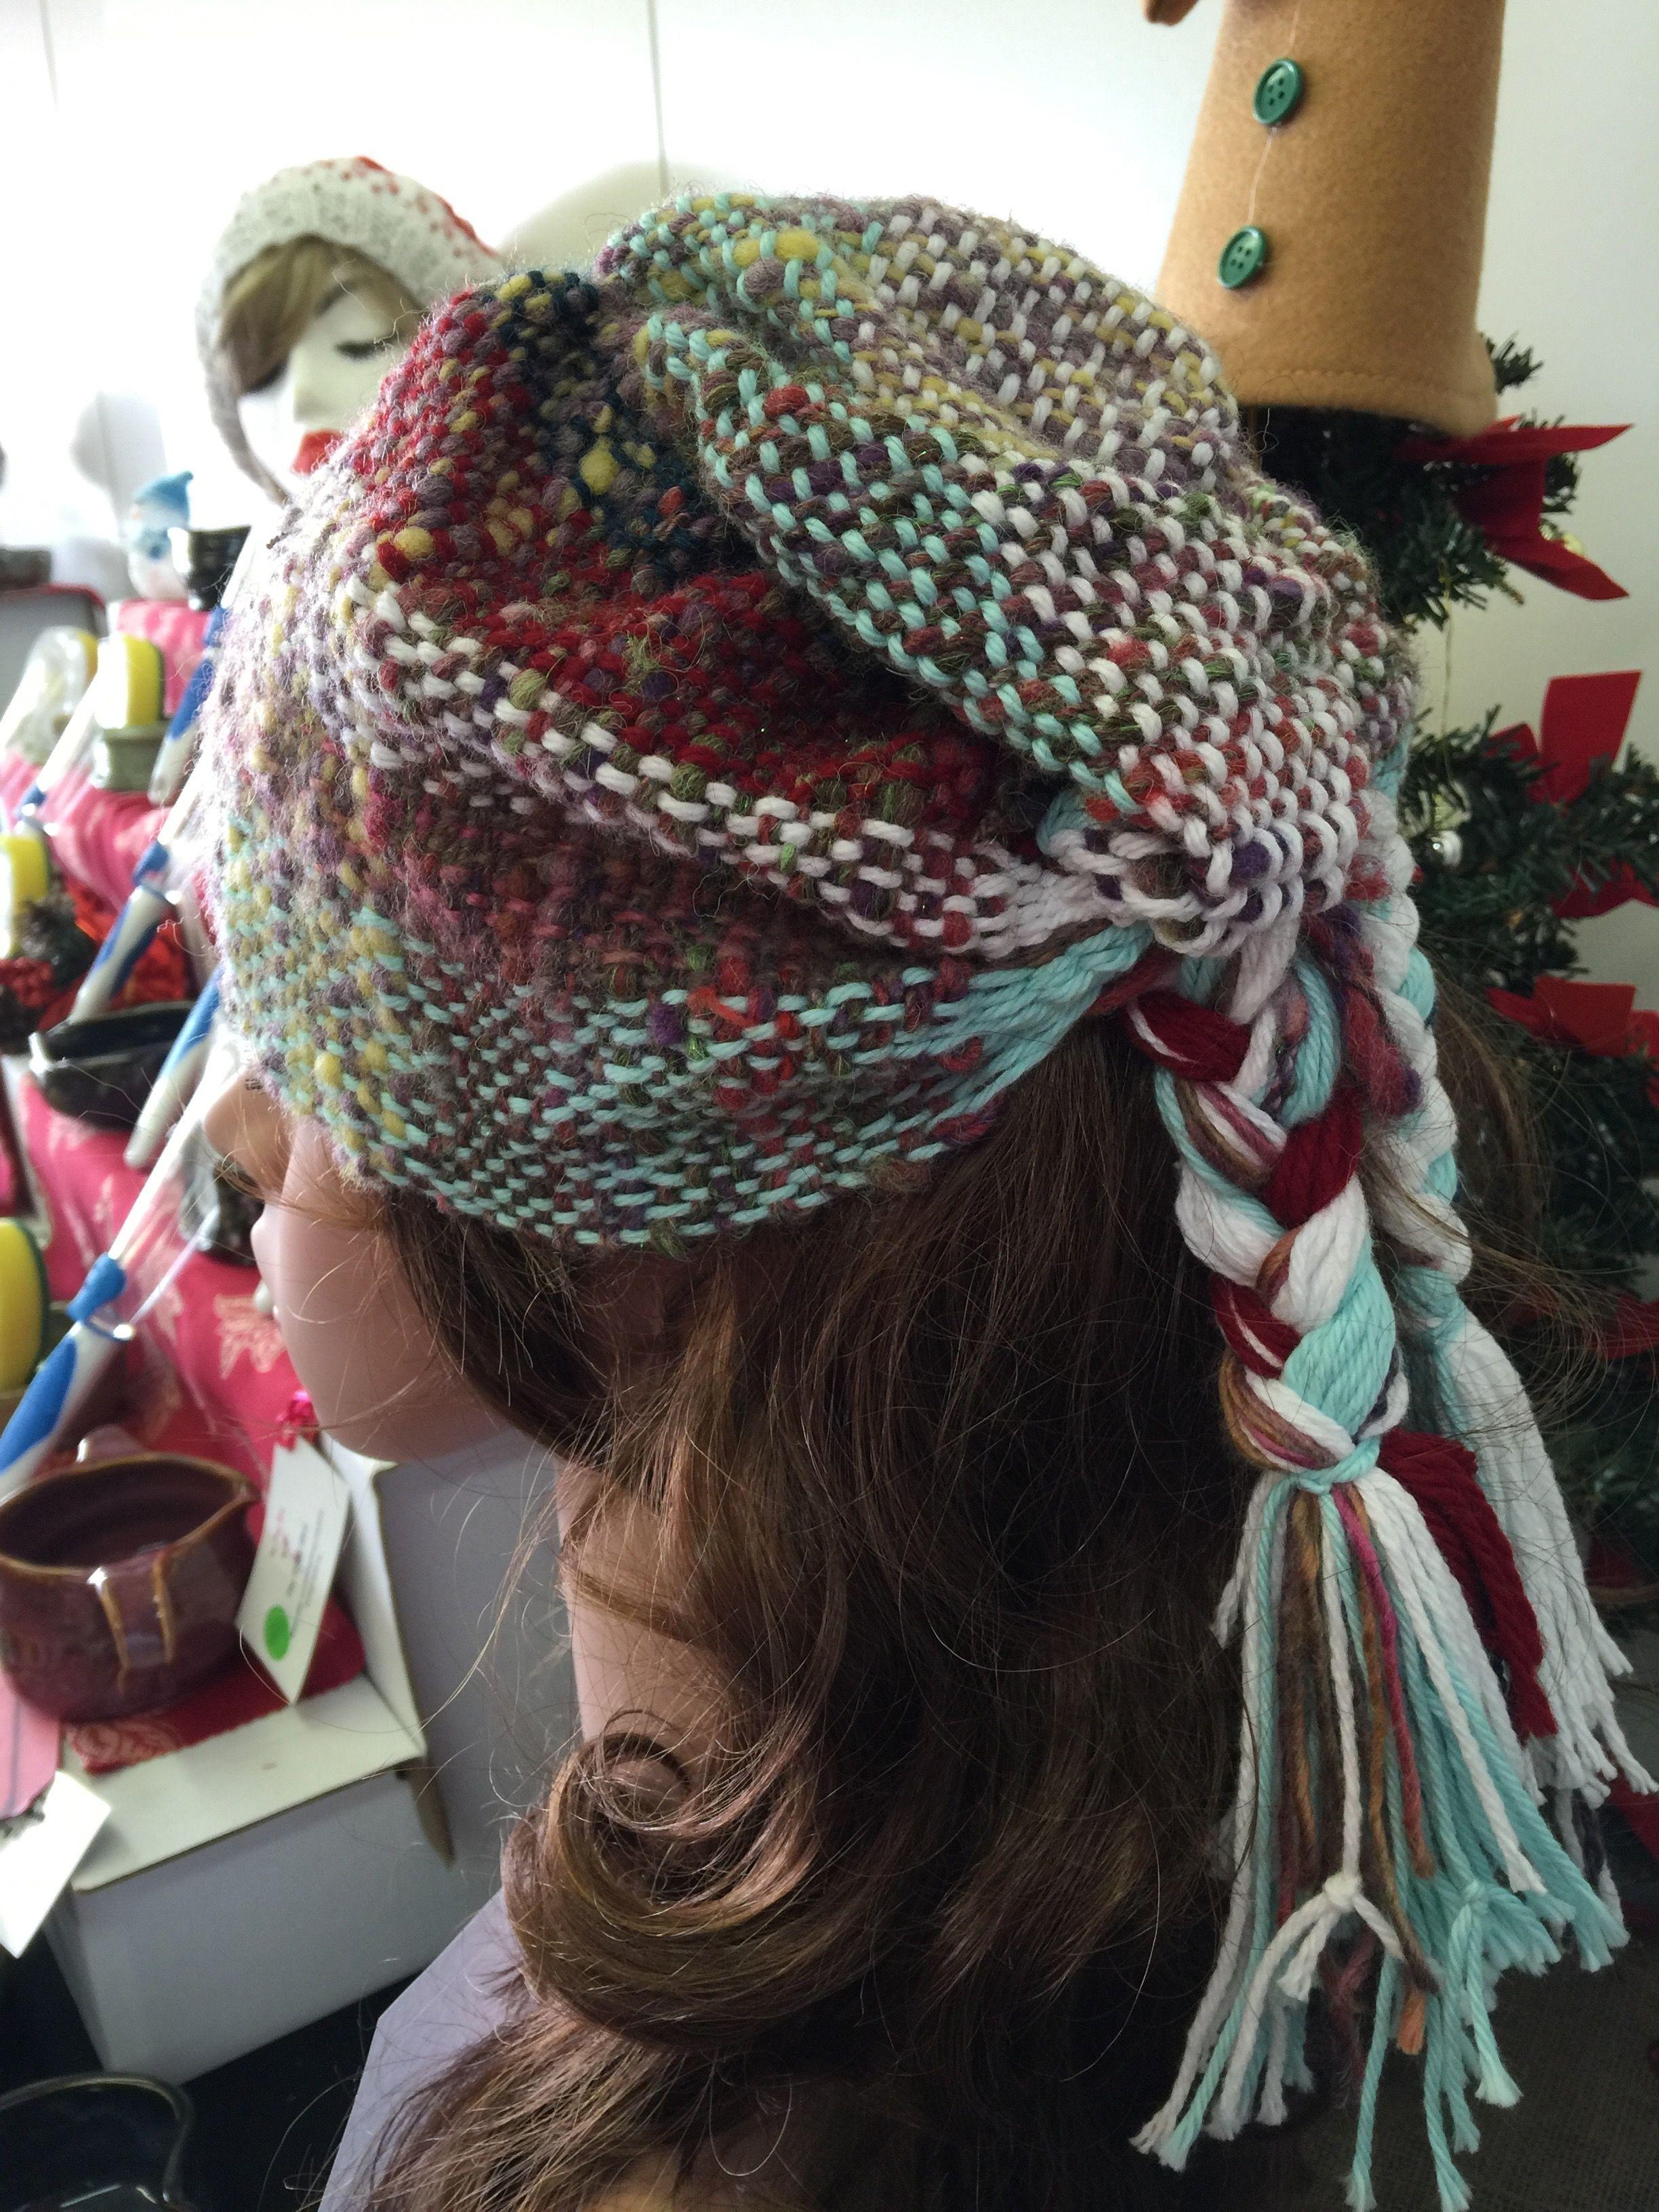 Pinned onto Handmade Pottery Yarn BowlsBoard in Knitting Category